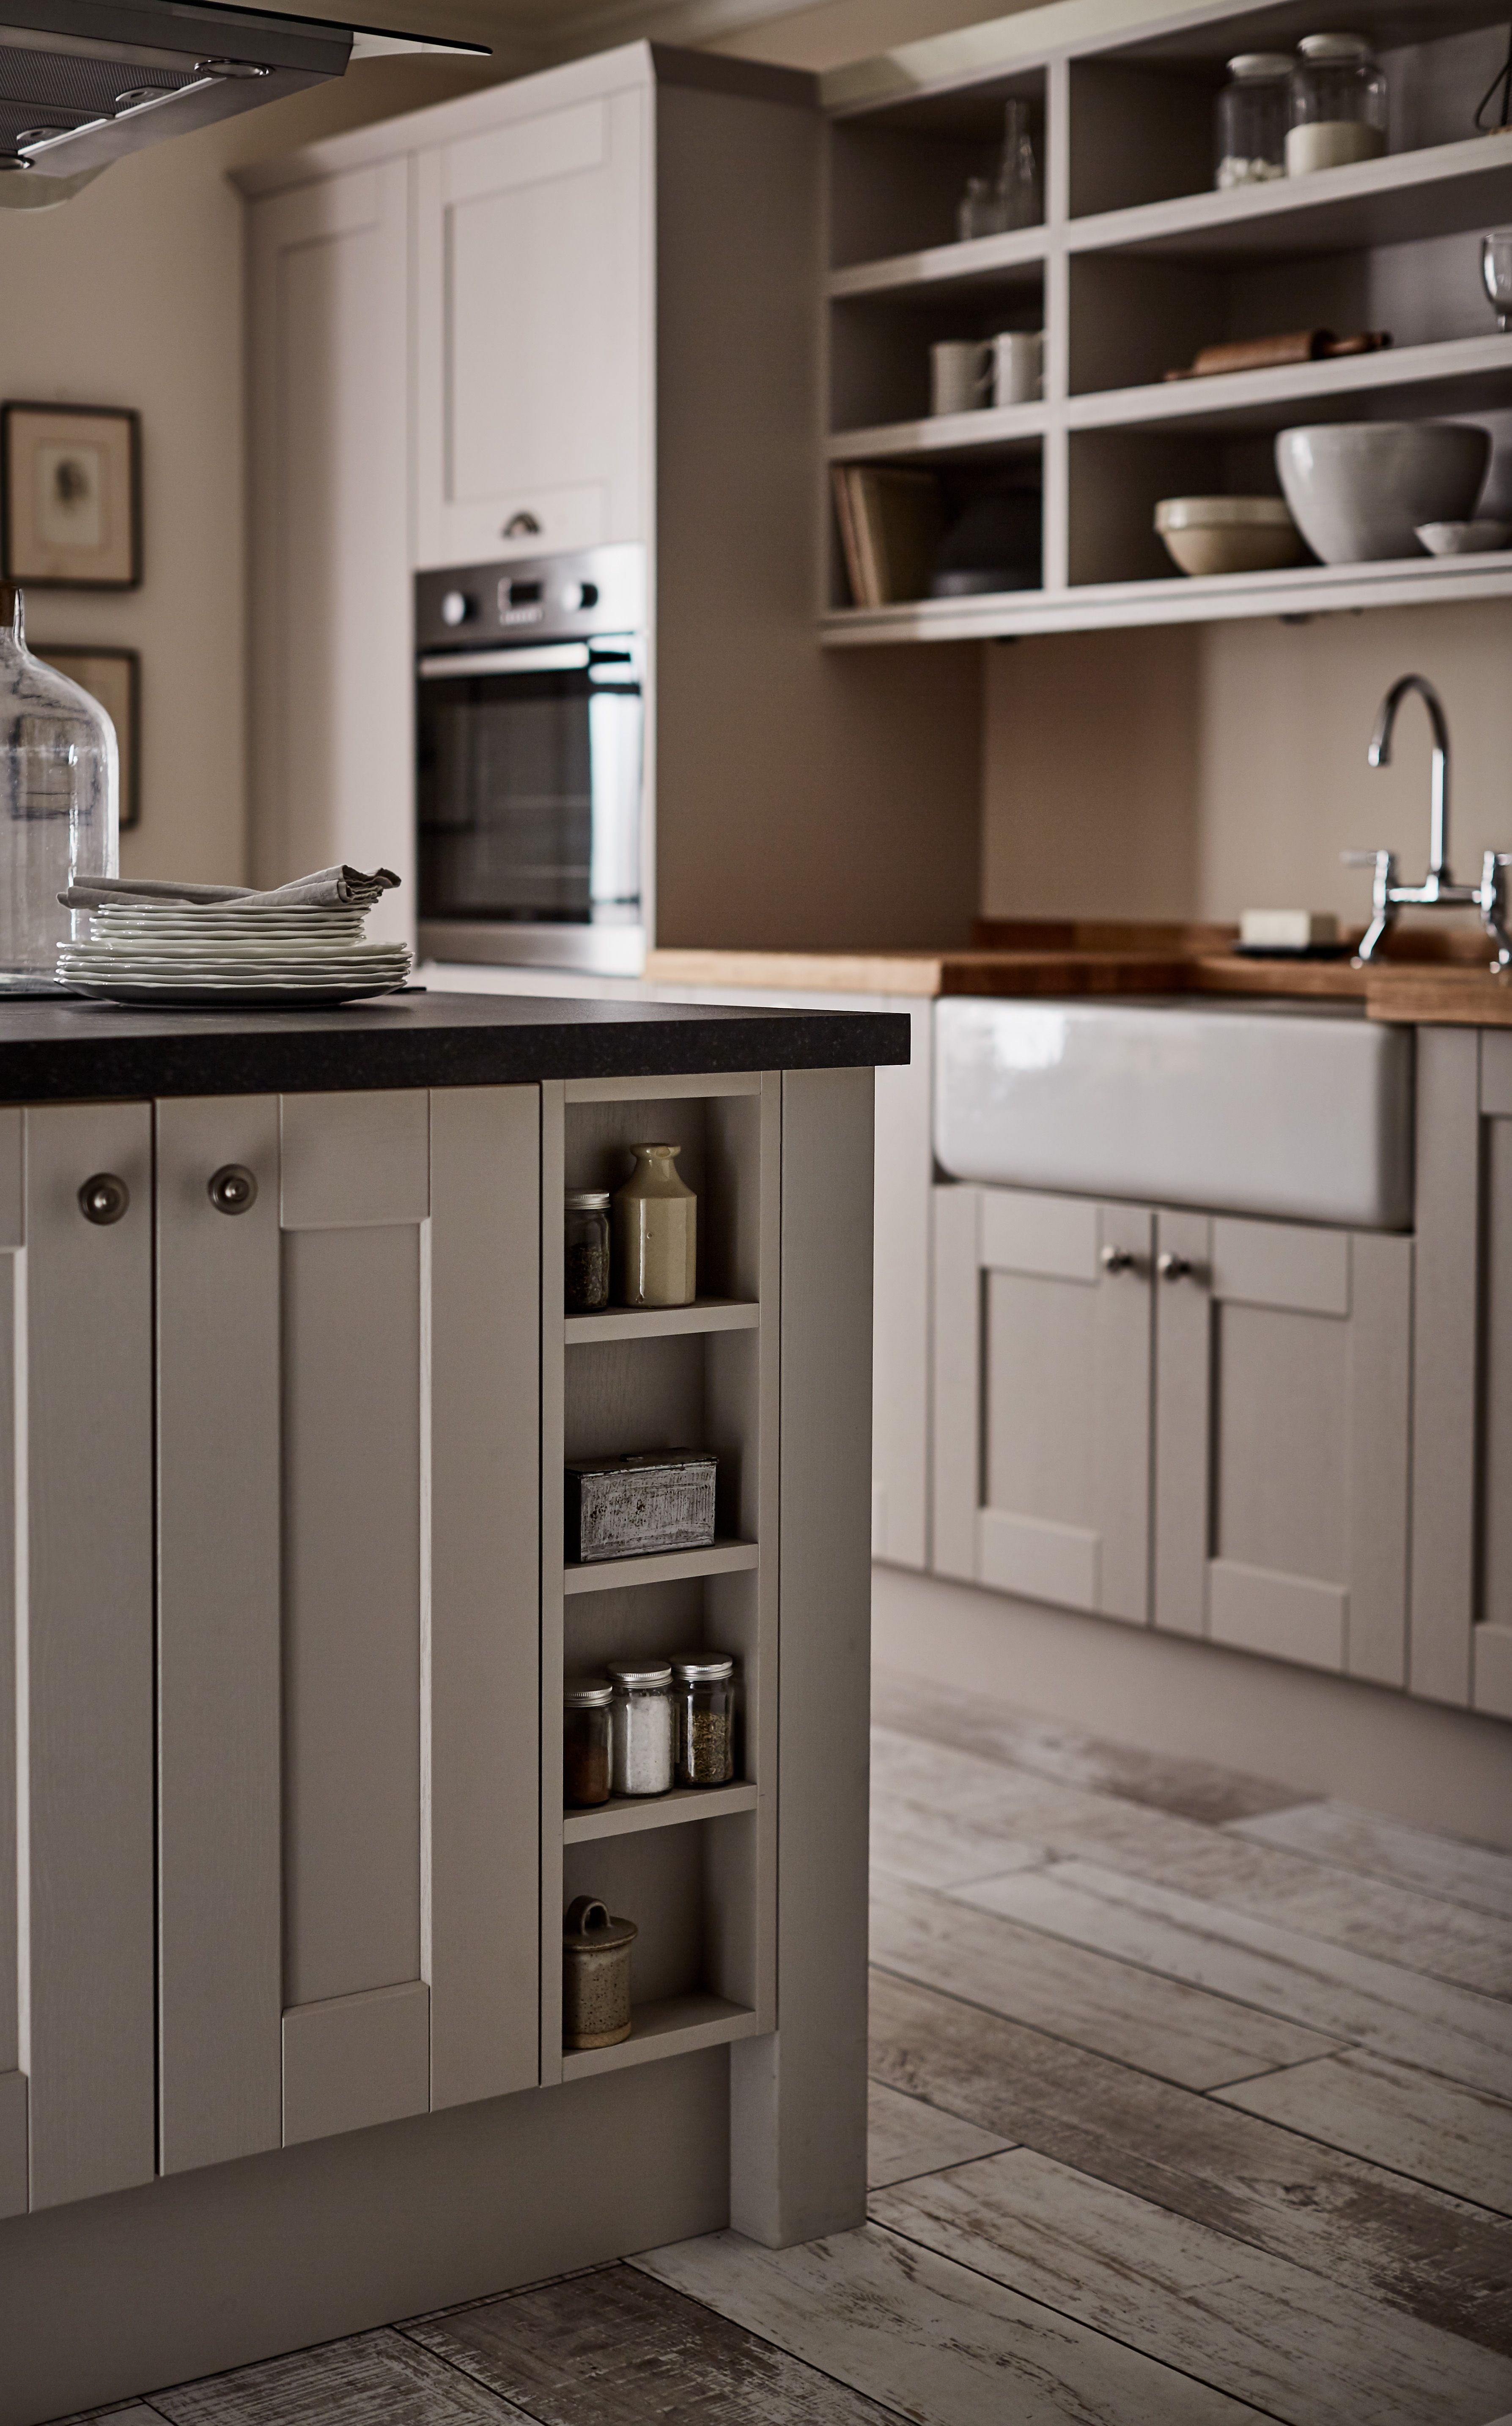 Kitchens Cashmere kitchen, Shaker style kitchen